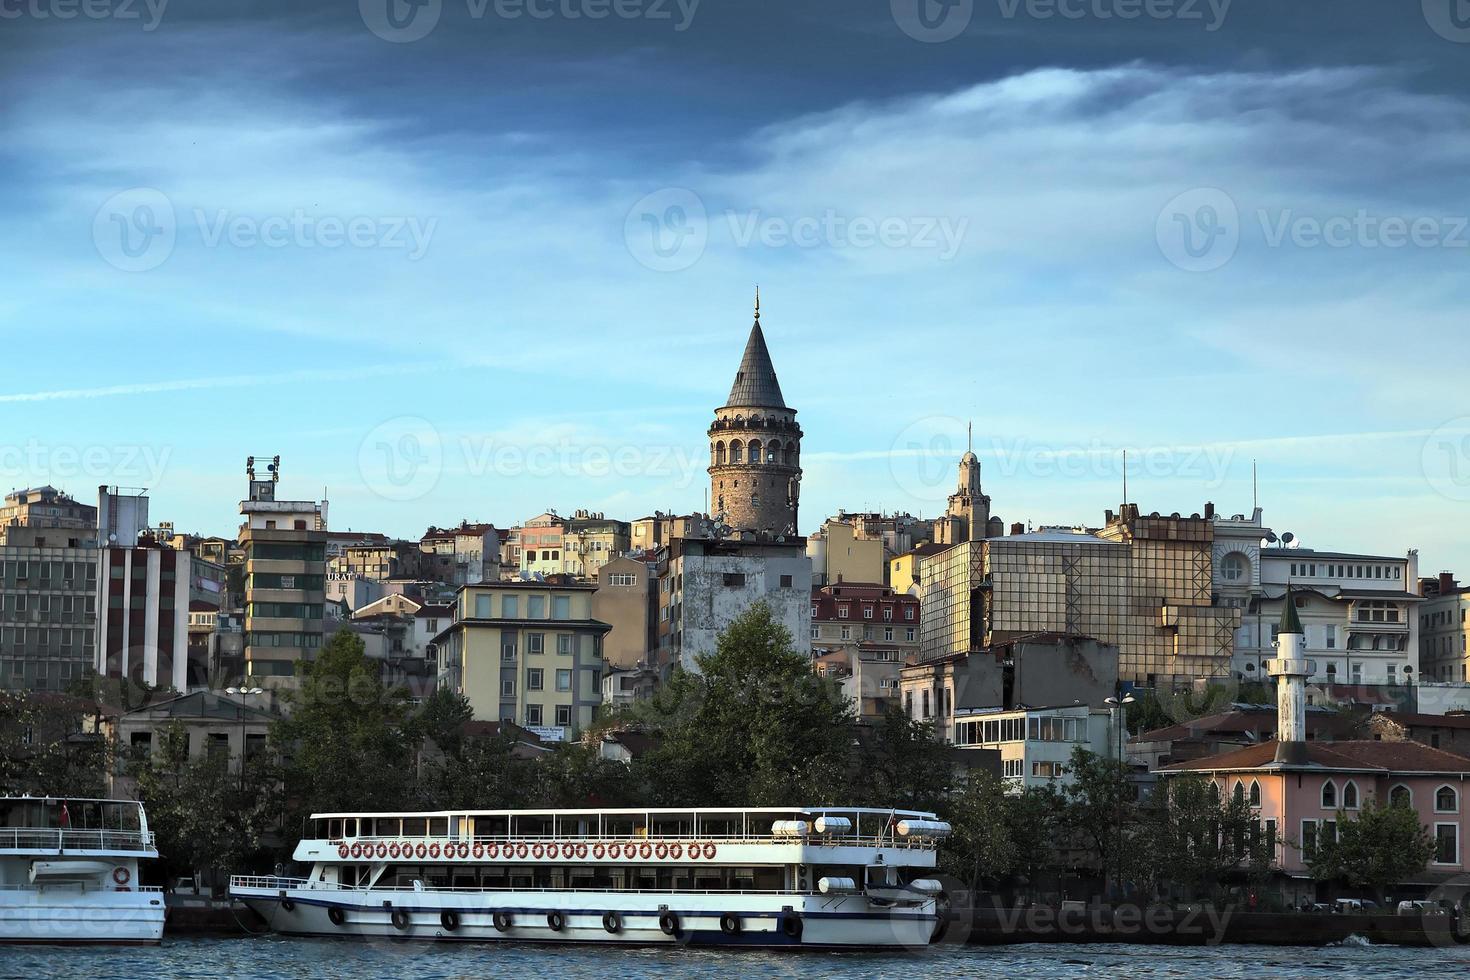 Galataturm - Istanbuler Blick auf das Meer, Bosporus, Truthahn. foto